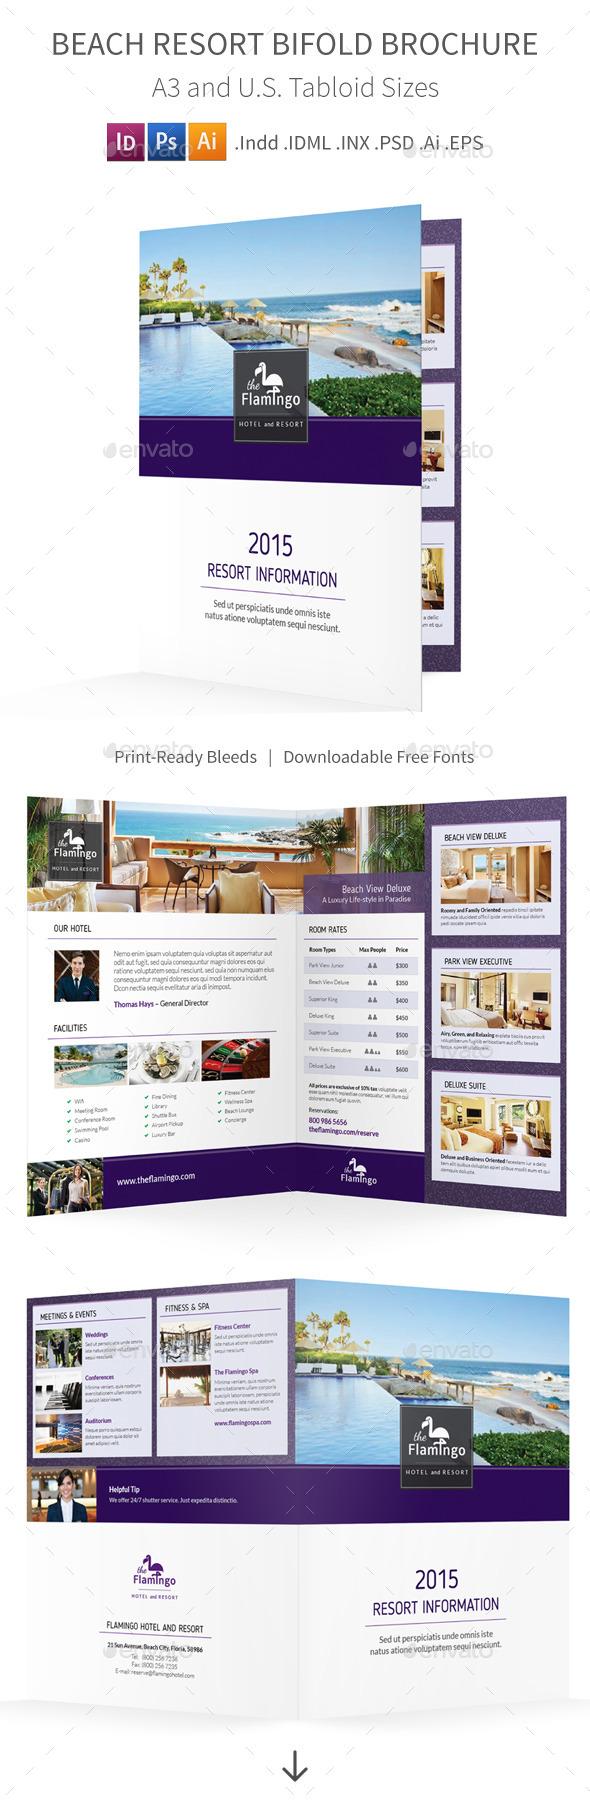 GraphicRiver Beach Resort Bifold Halffold Brochure 11452460